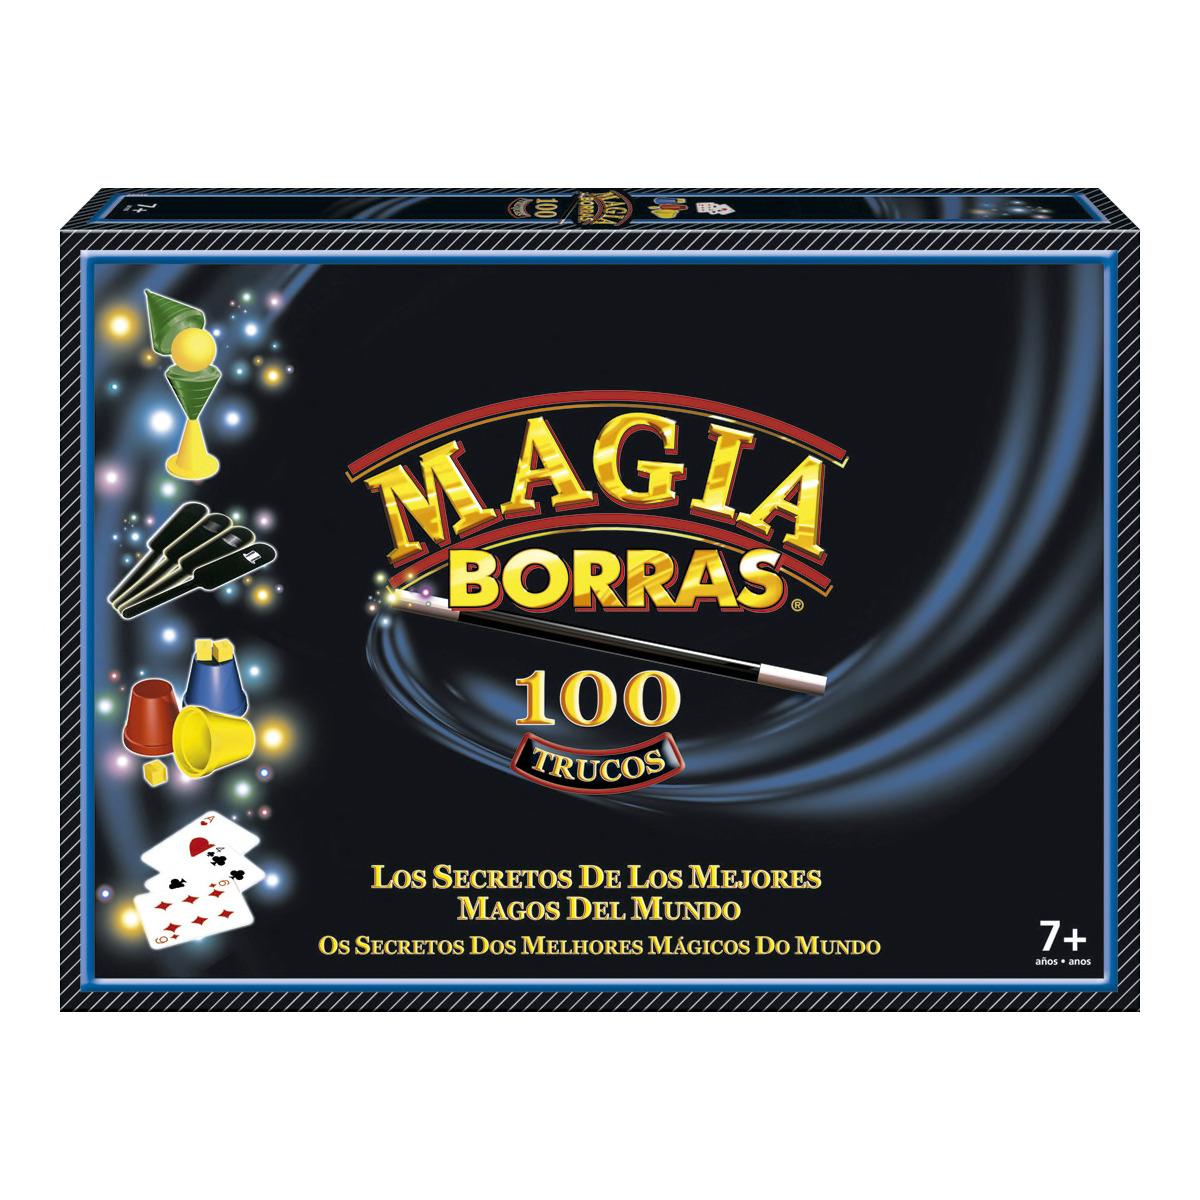 Magia Borrás Clásica 100 trucos Educa Borrás